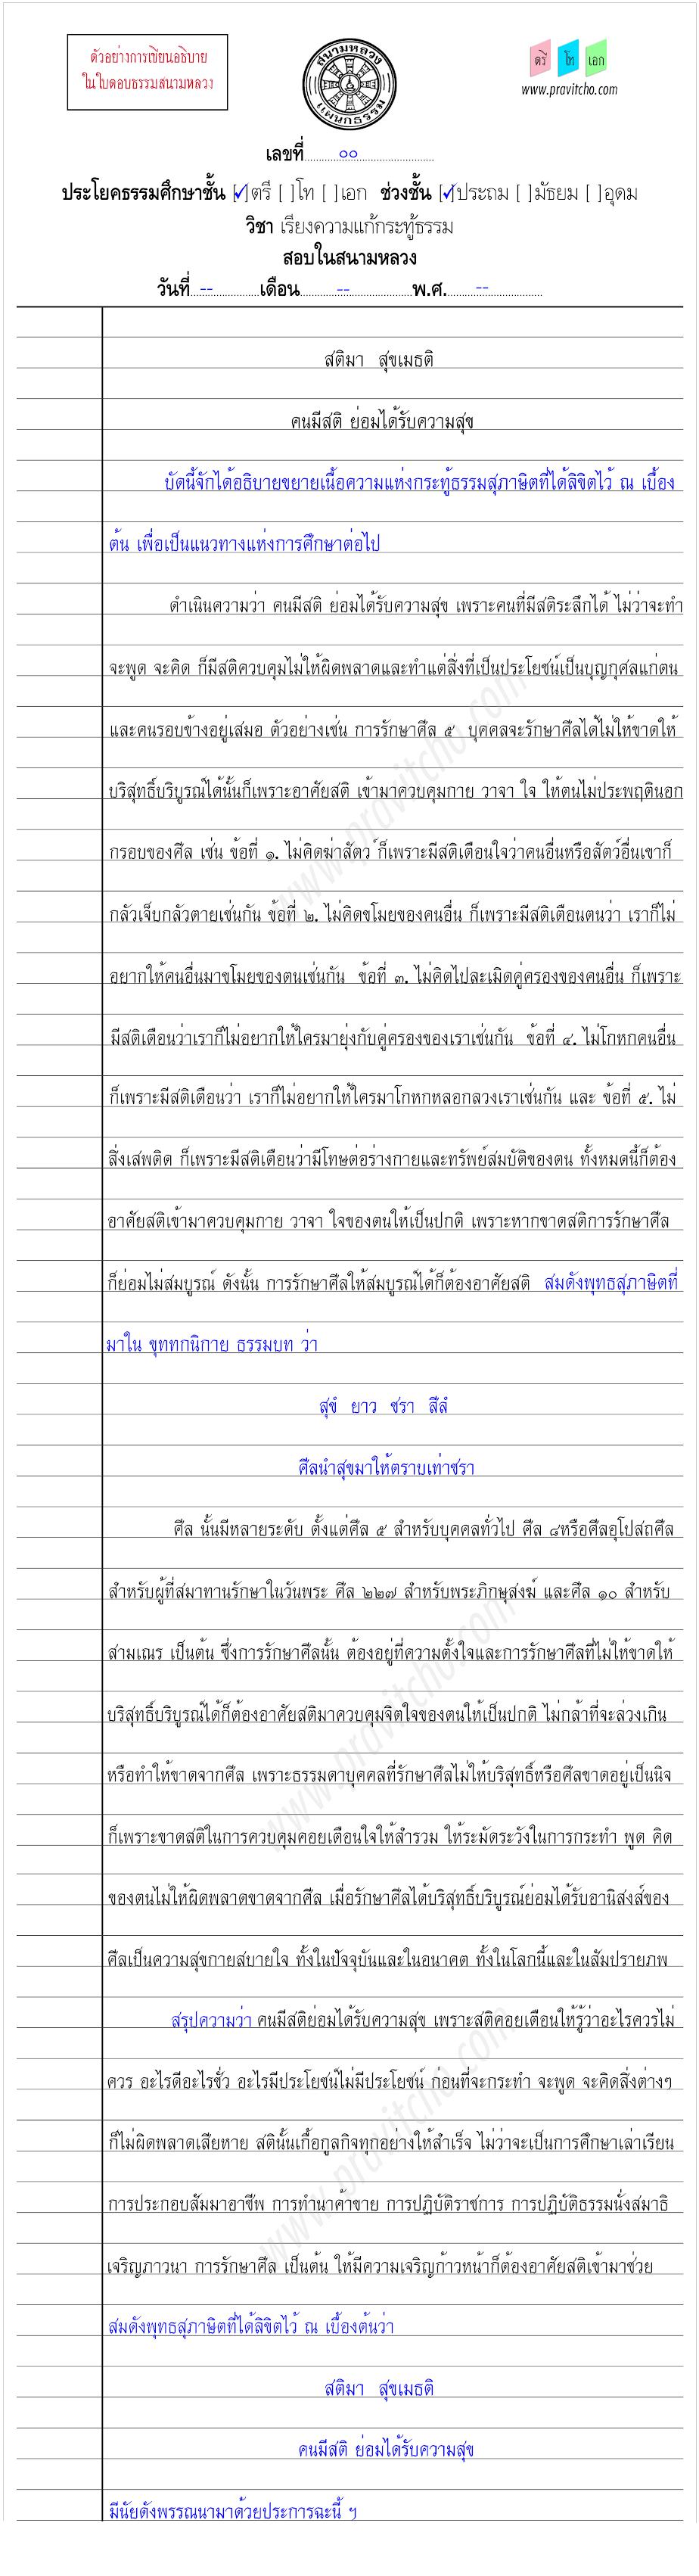 <h1>ตัวอย่างการเขียนอธิบายกระทู้ธรรมชั้นตรี</h1>